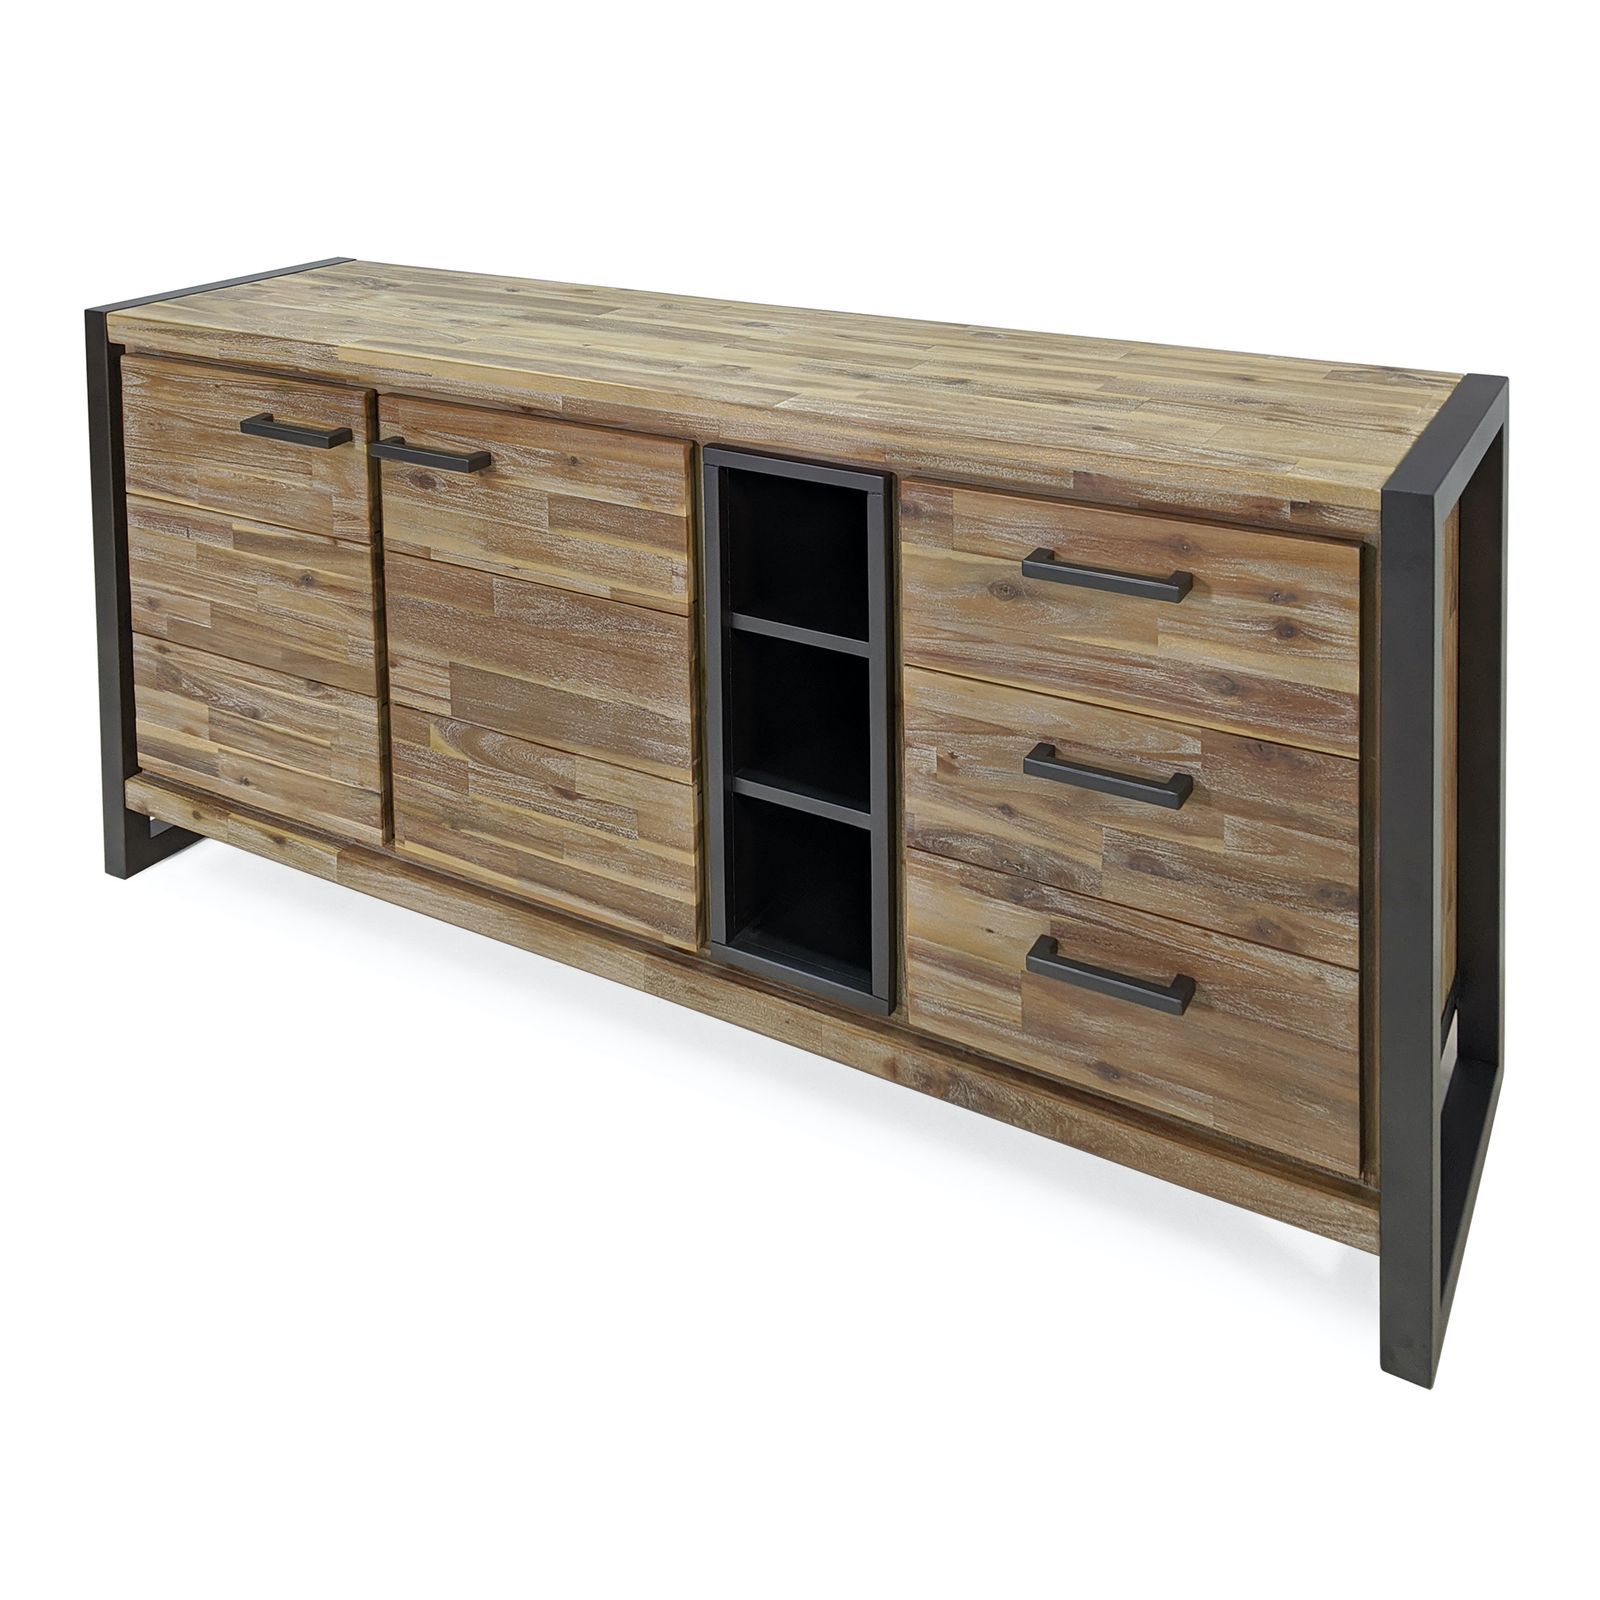 Sideboard Oli in Braun / Grau 160 x 80 cm